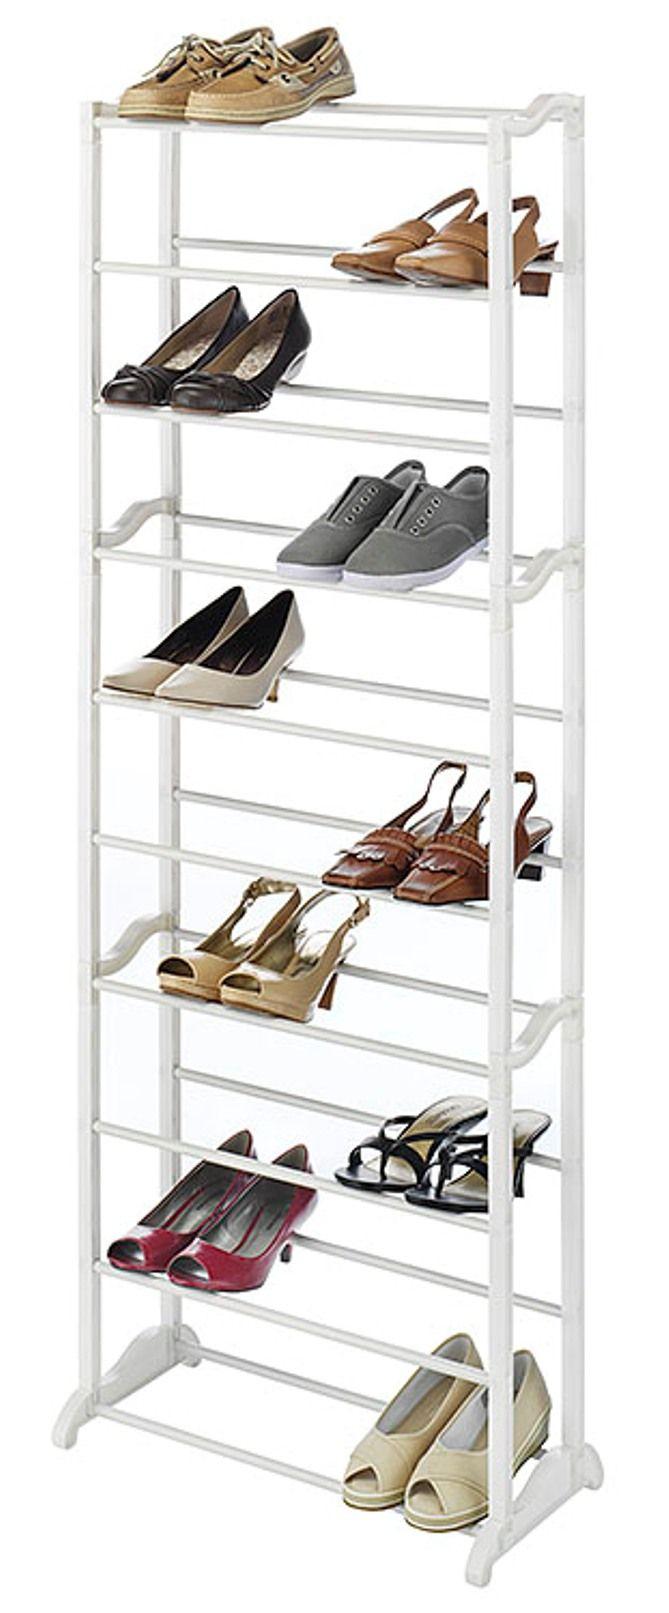 30 Pair Shoe Rack $9.99! - http://www.pinchingyourpennies.com/30 ...